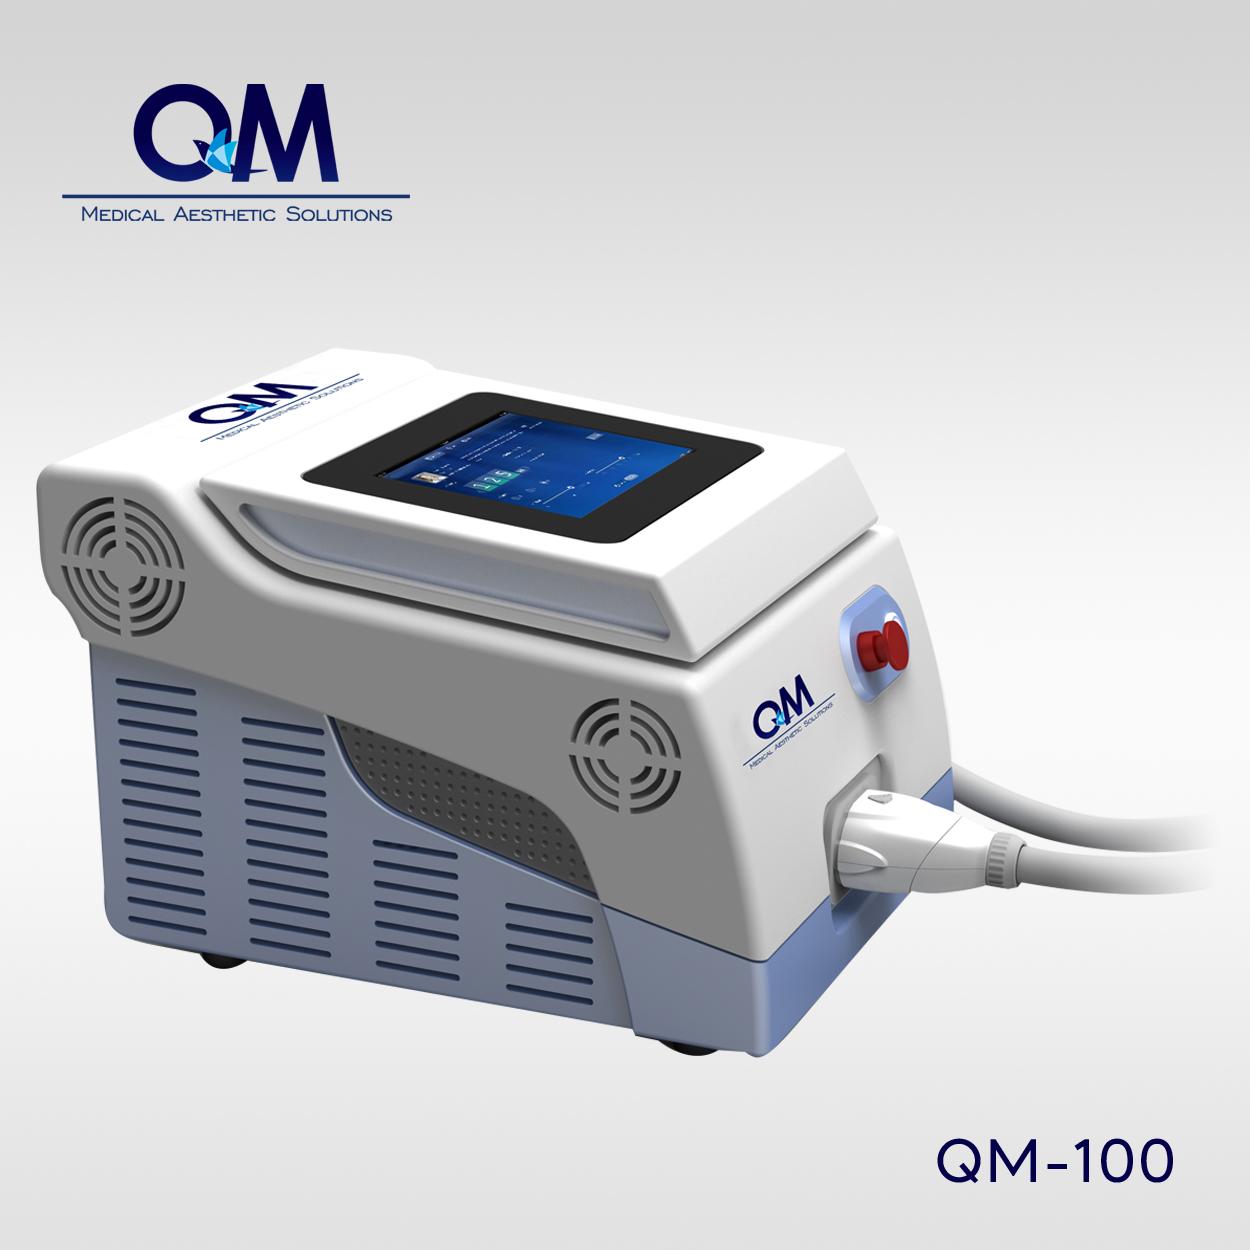 QM-100